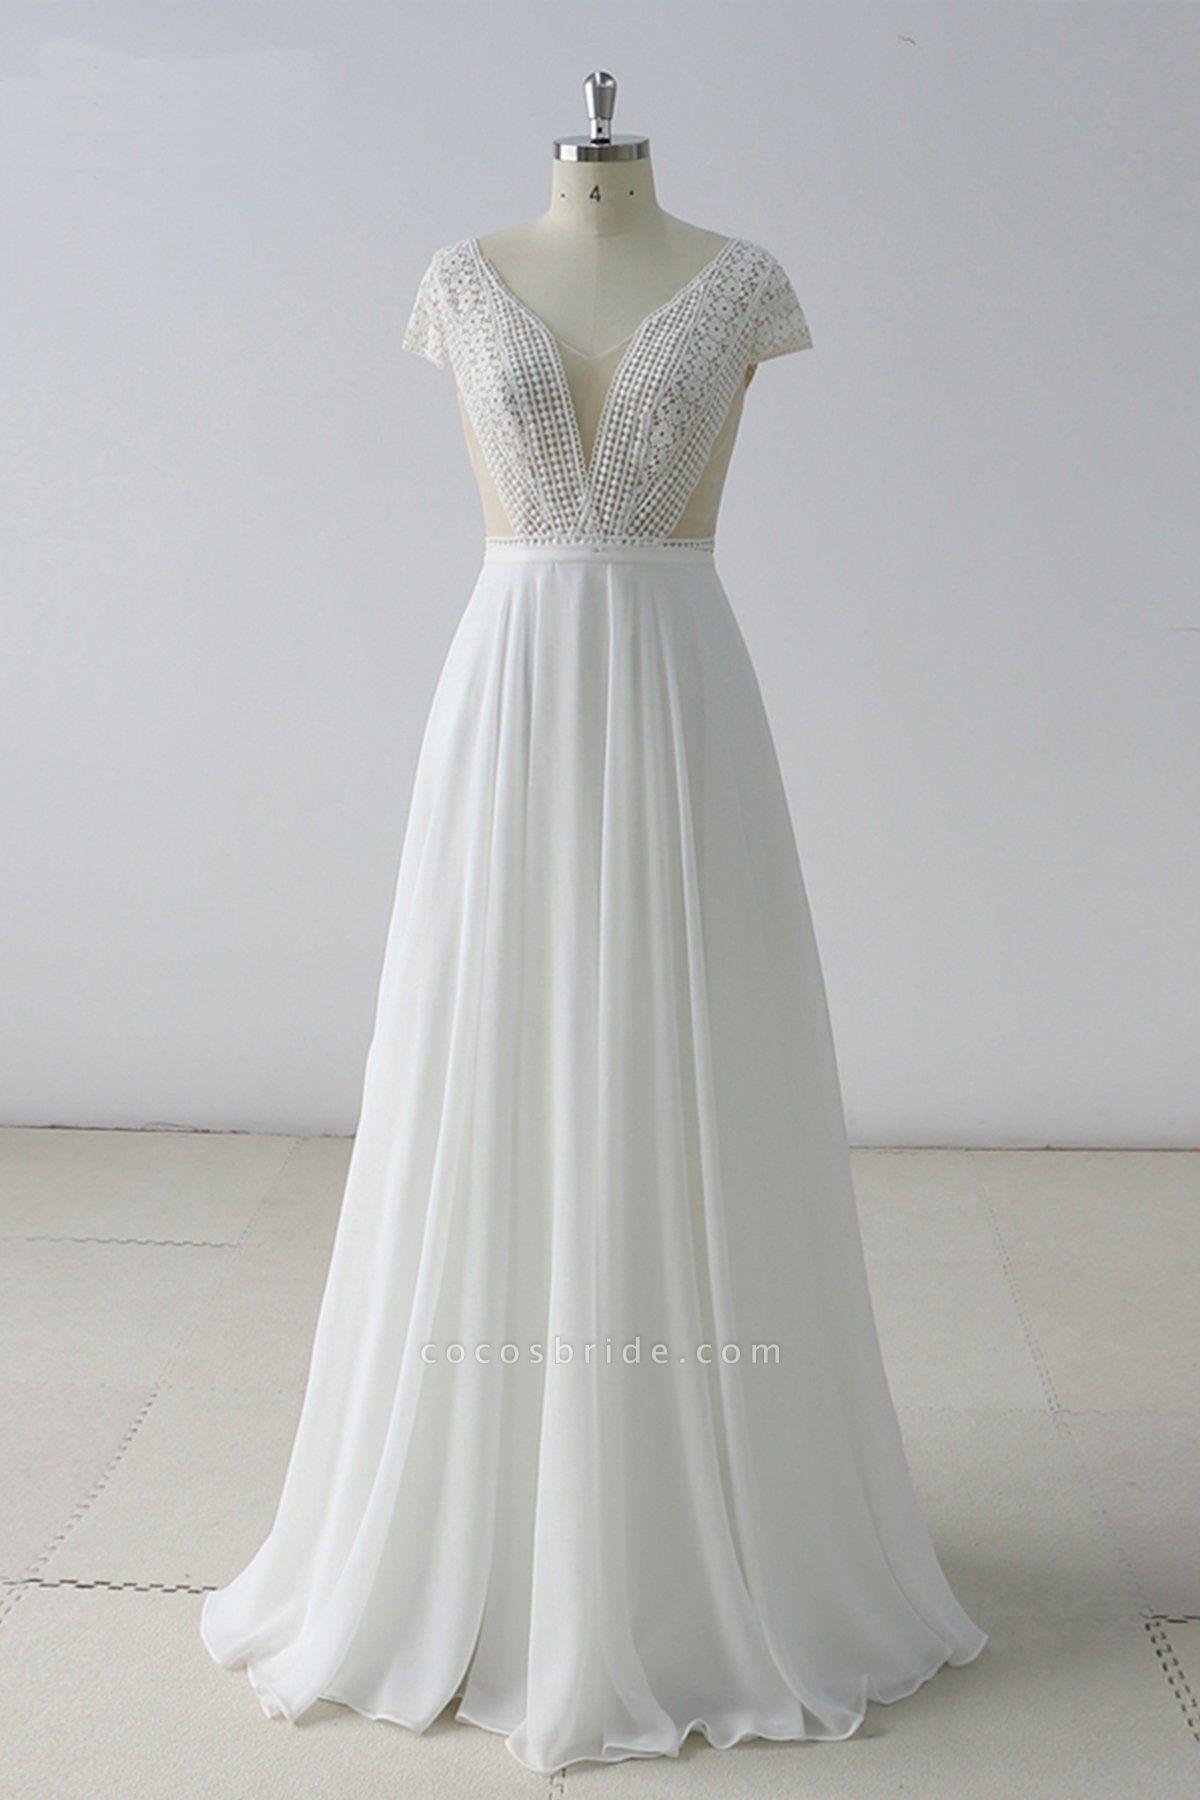 White Lace Backless V Neck Long Wedding Dress